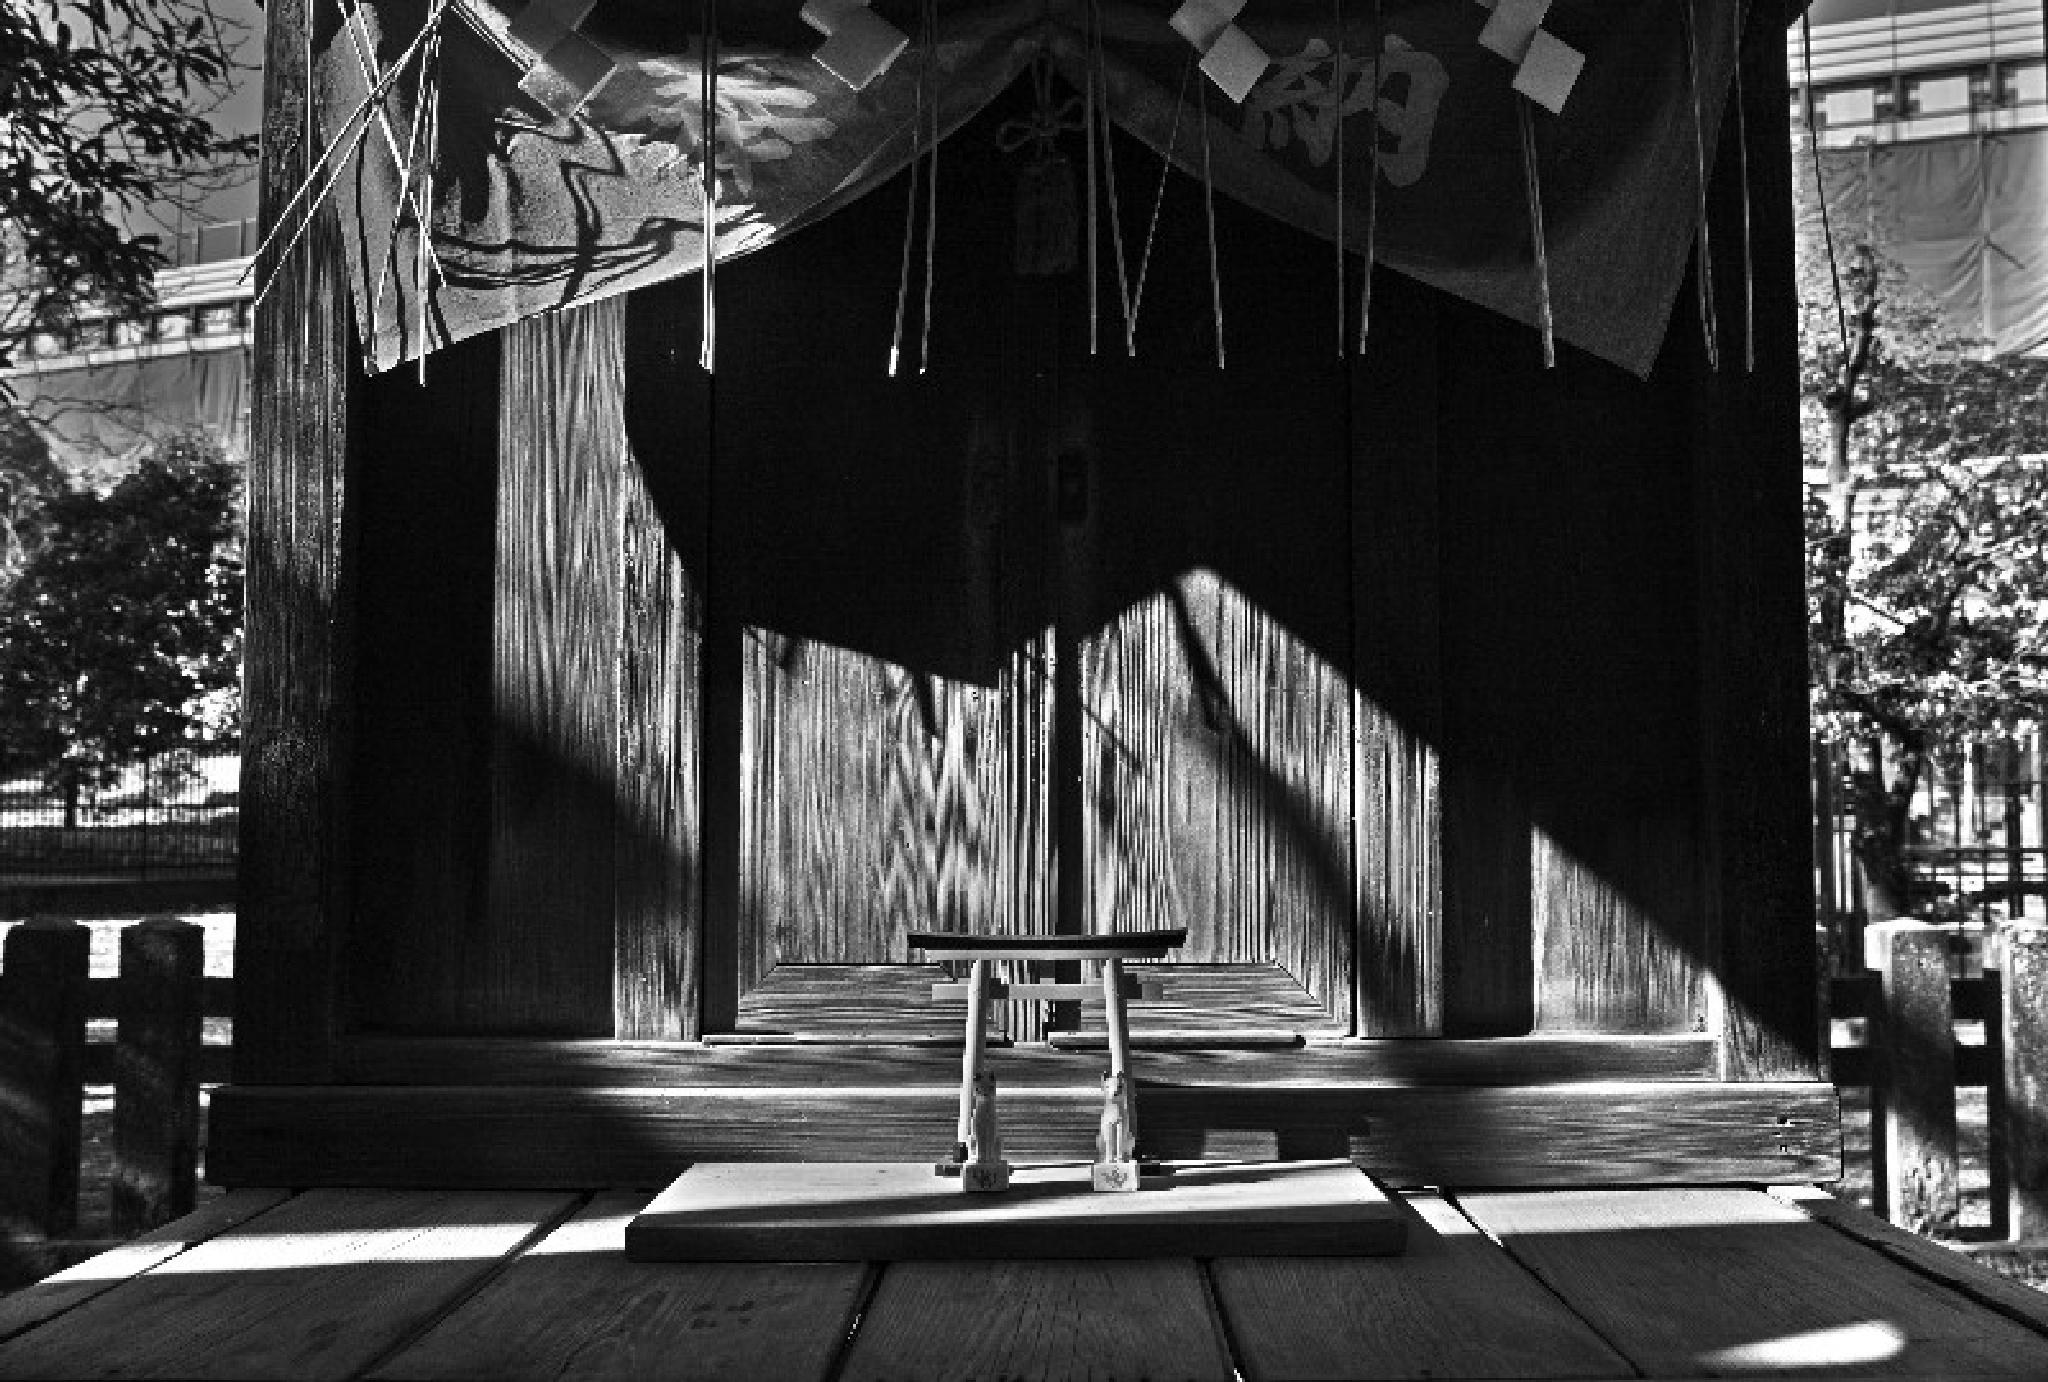 Untitled by Kenji Ishida